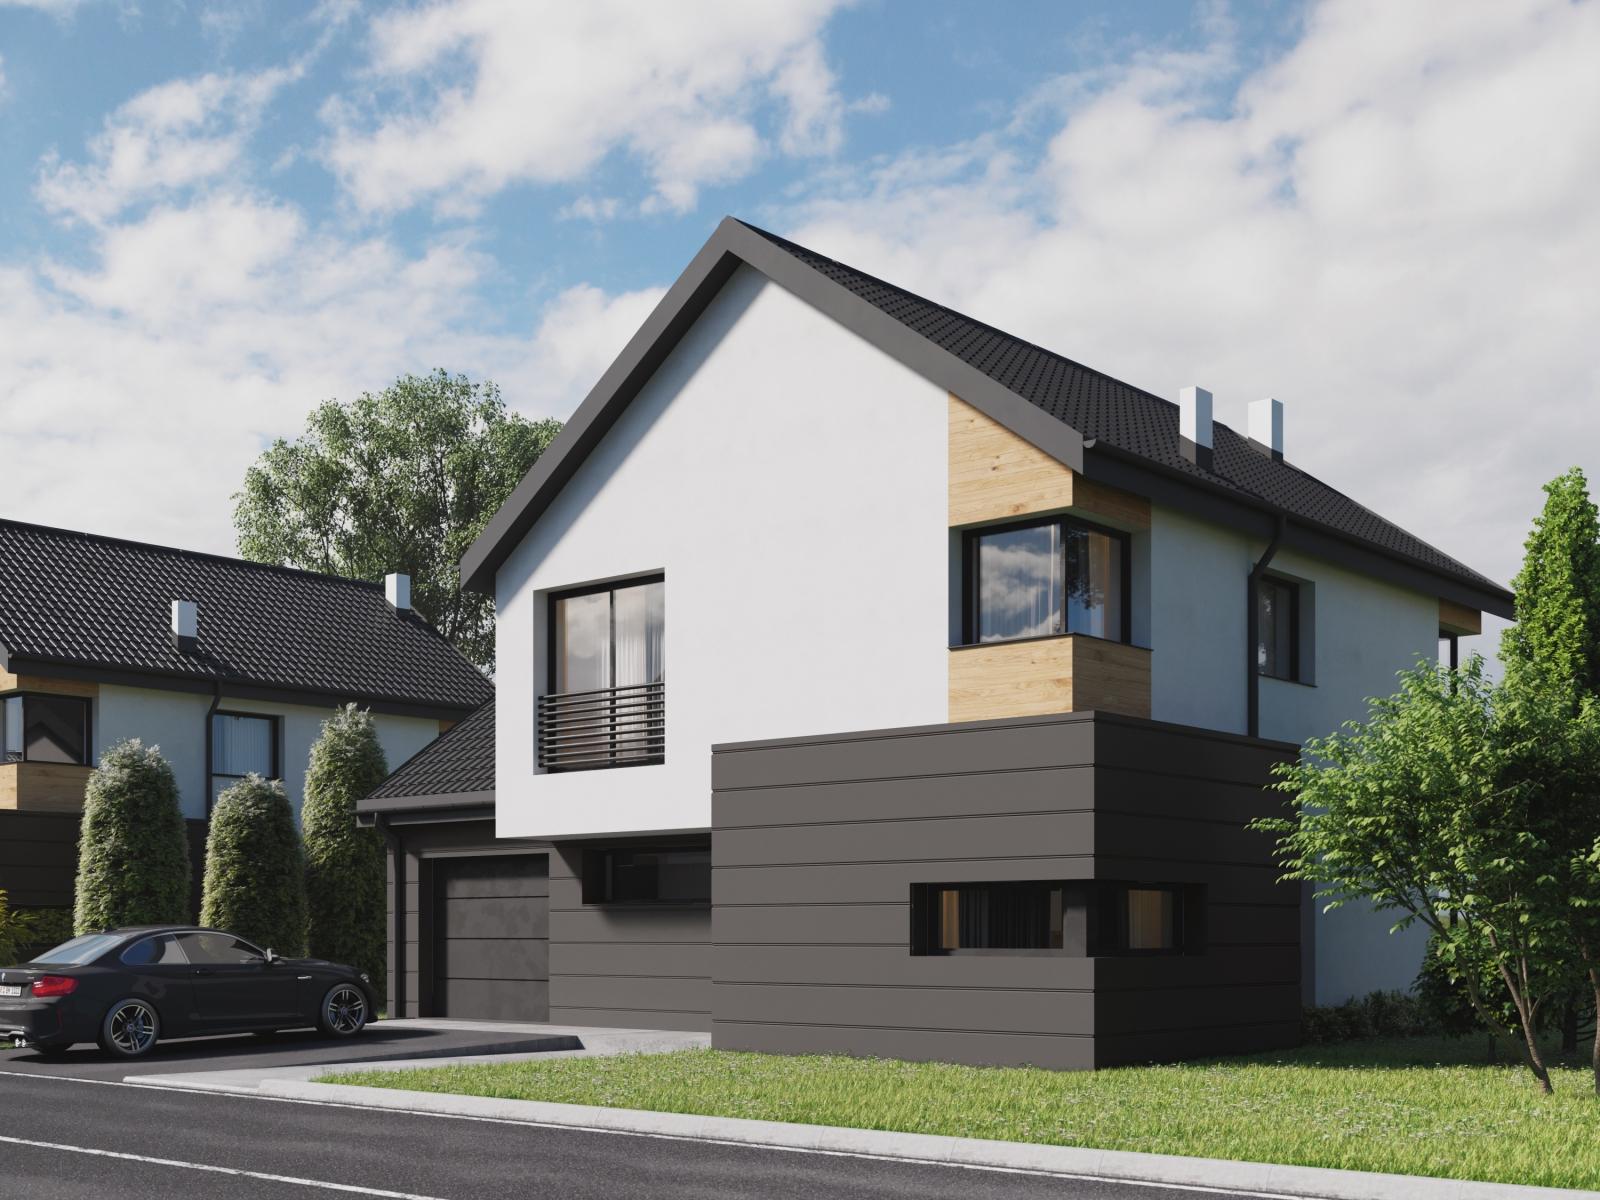 Visualization of Modern TownHouse